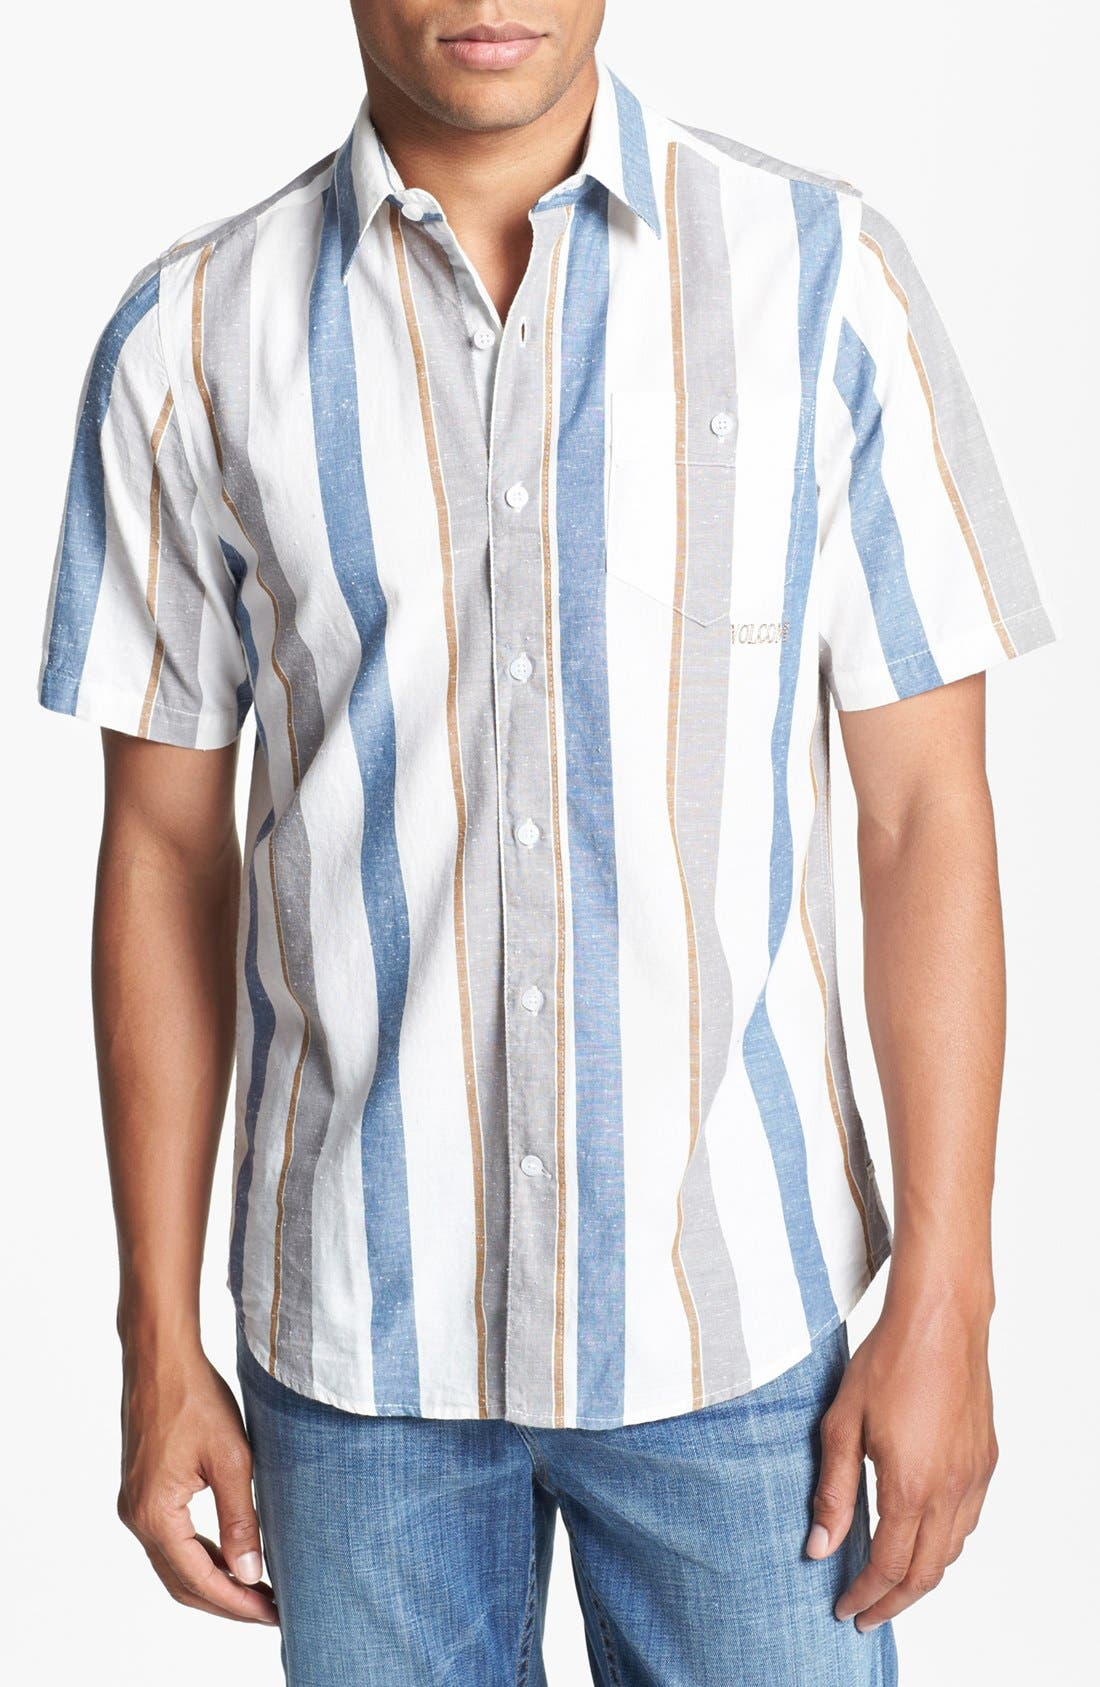 Main Image - Volcom 'Memento' Stripe Print Woven Shirt